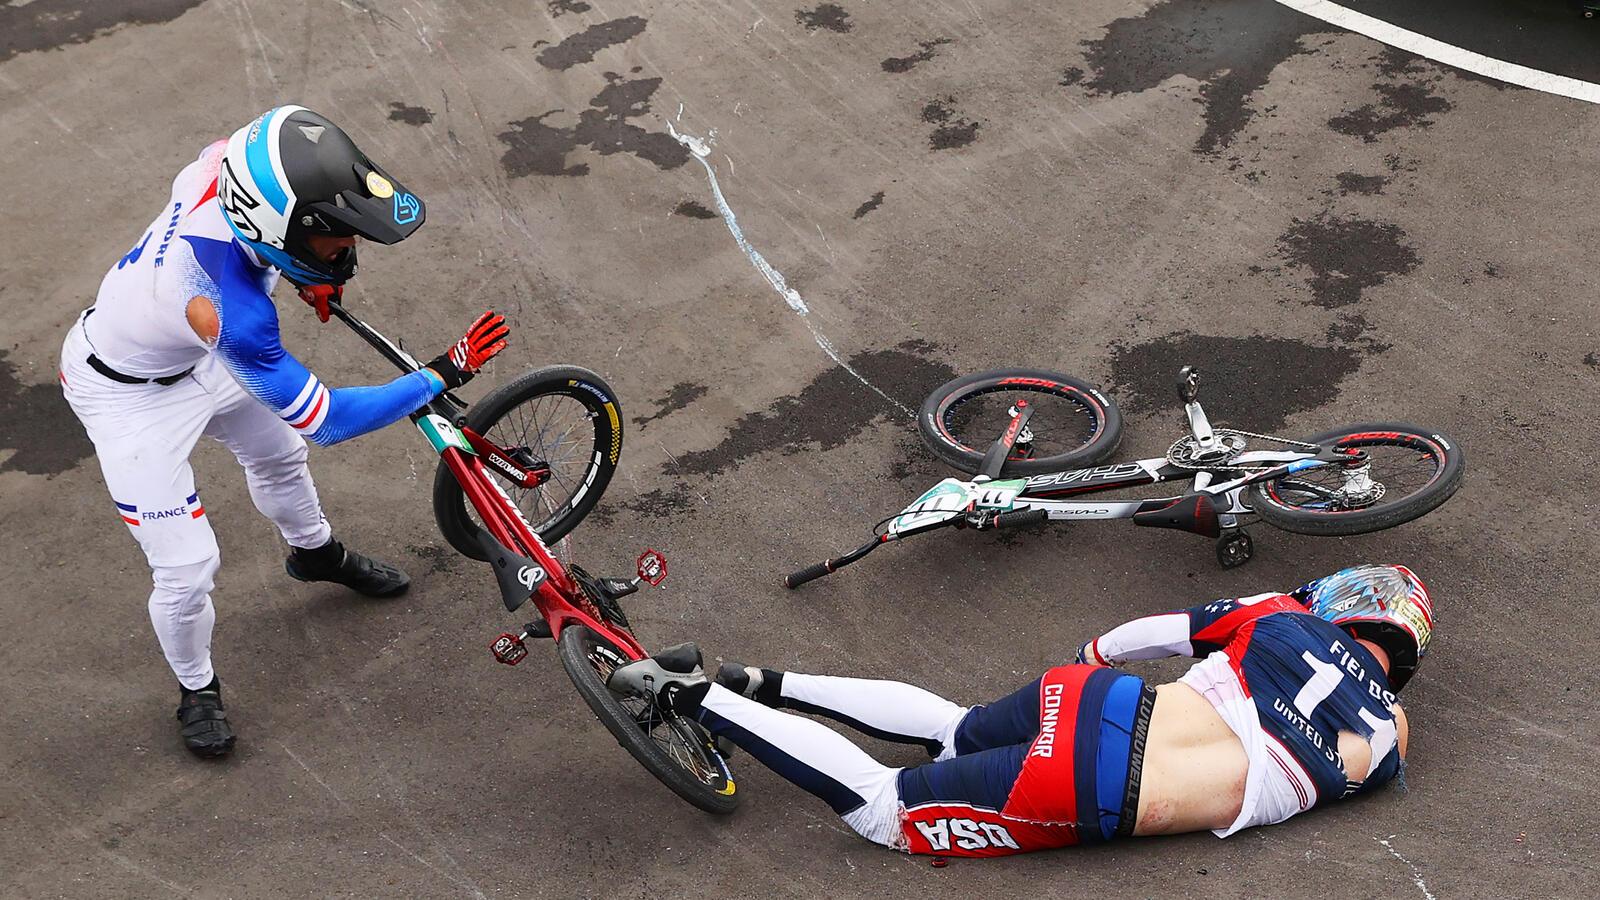 Texas BMX Champ Recovering After Horrific Crash At Tokyo Olympics